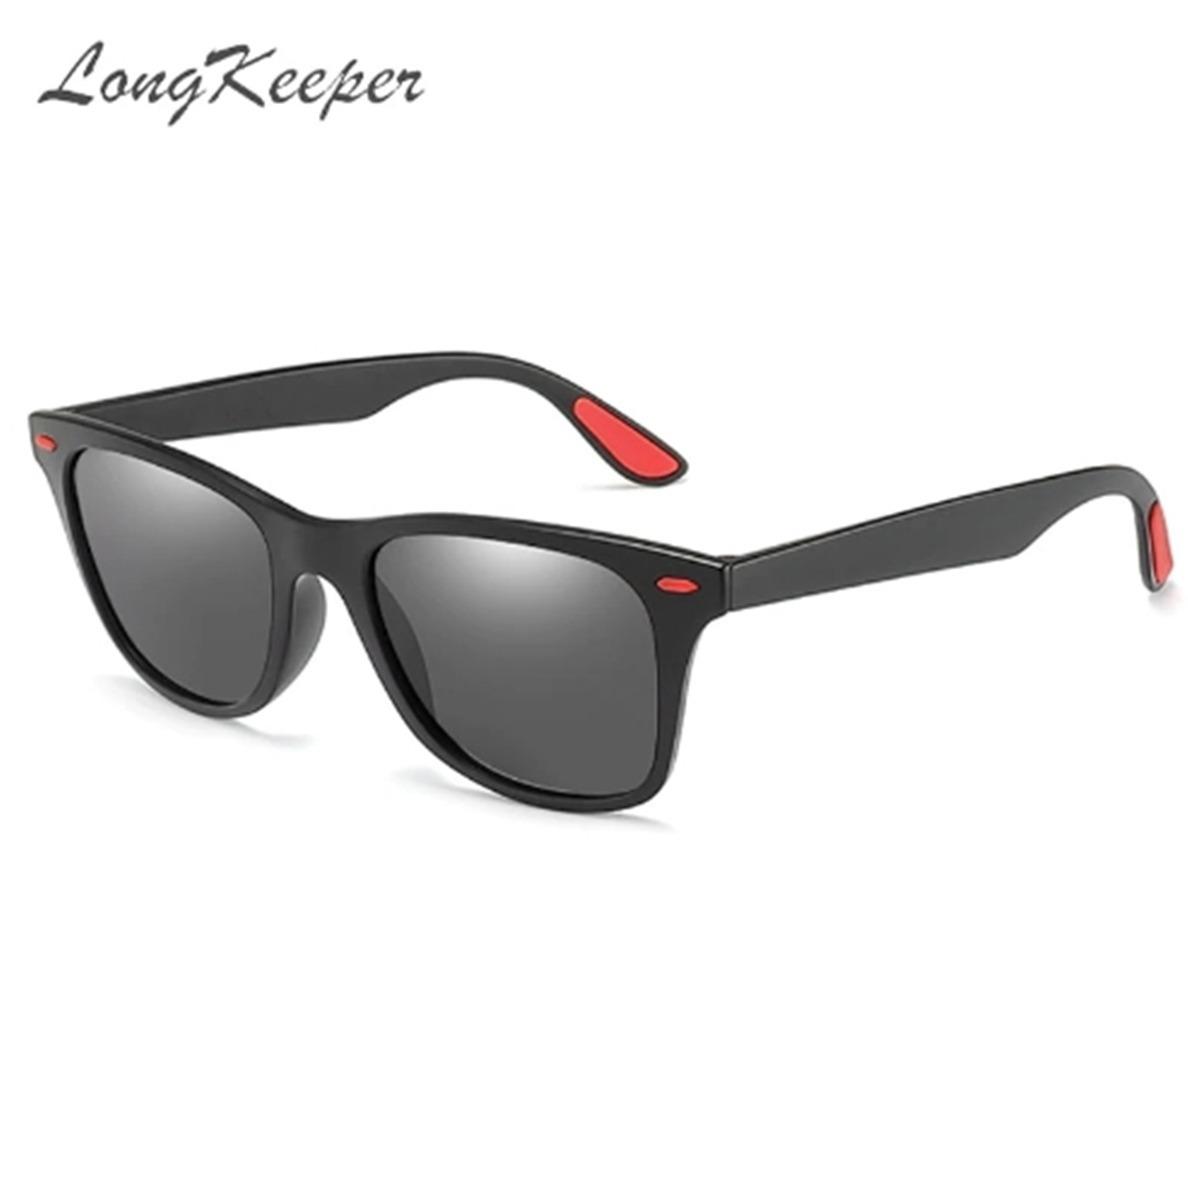 168b5ca6f1062 óculos polarizado masculino visão noturna long keeper barato. Carregando  zoom.